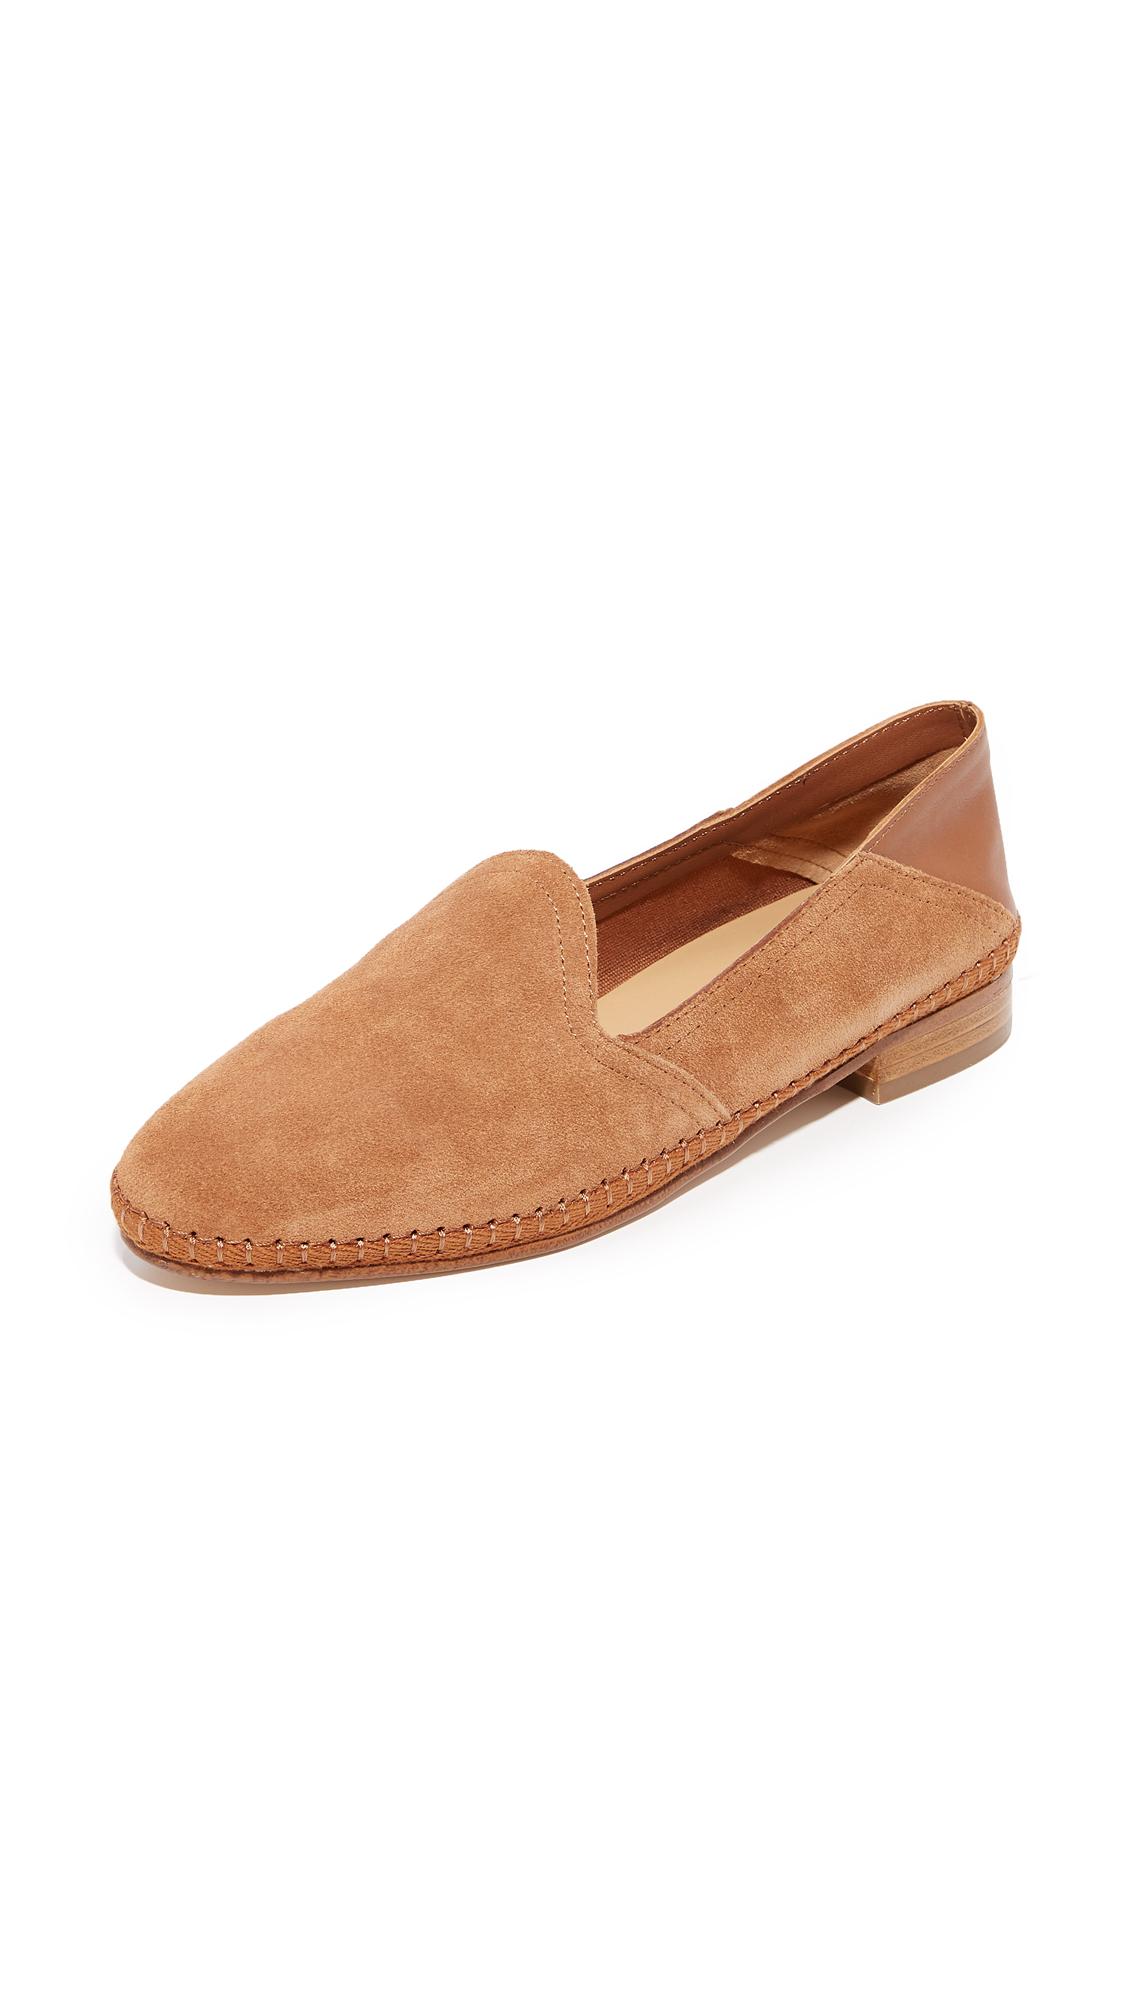 Soludos Venetian Convertible Loafers - Tan